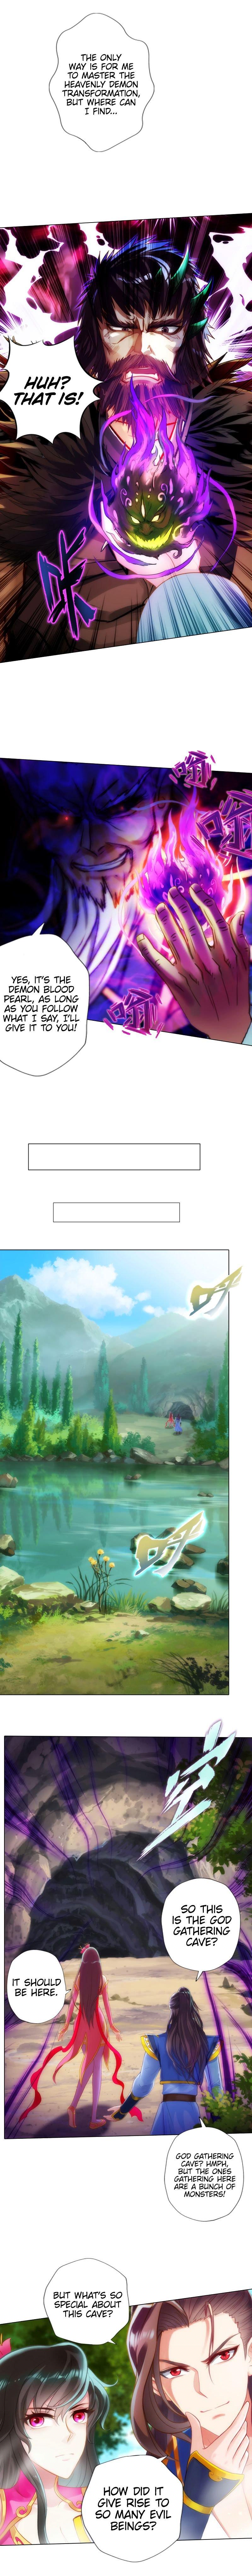 Manga Lang Huan Library - Chapter 74 Page 4